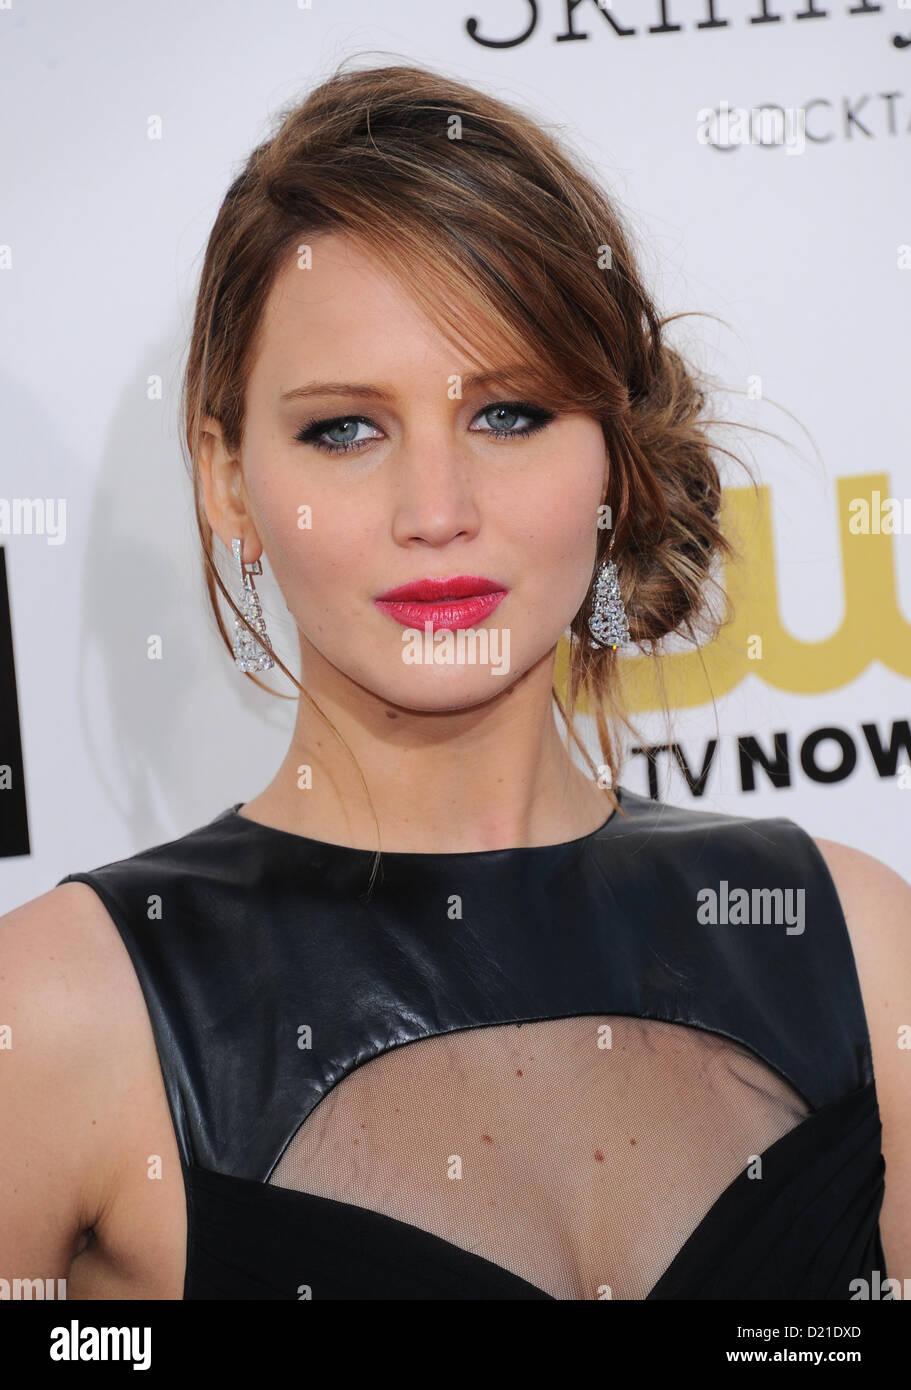 Jennifer Lawrence arrives at the 18th Annual Critics Choice film Awards in Santa Monica, California, USA, on January - Stock Image